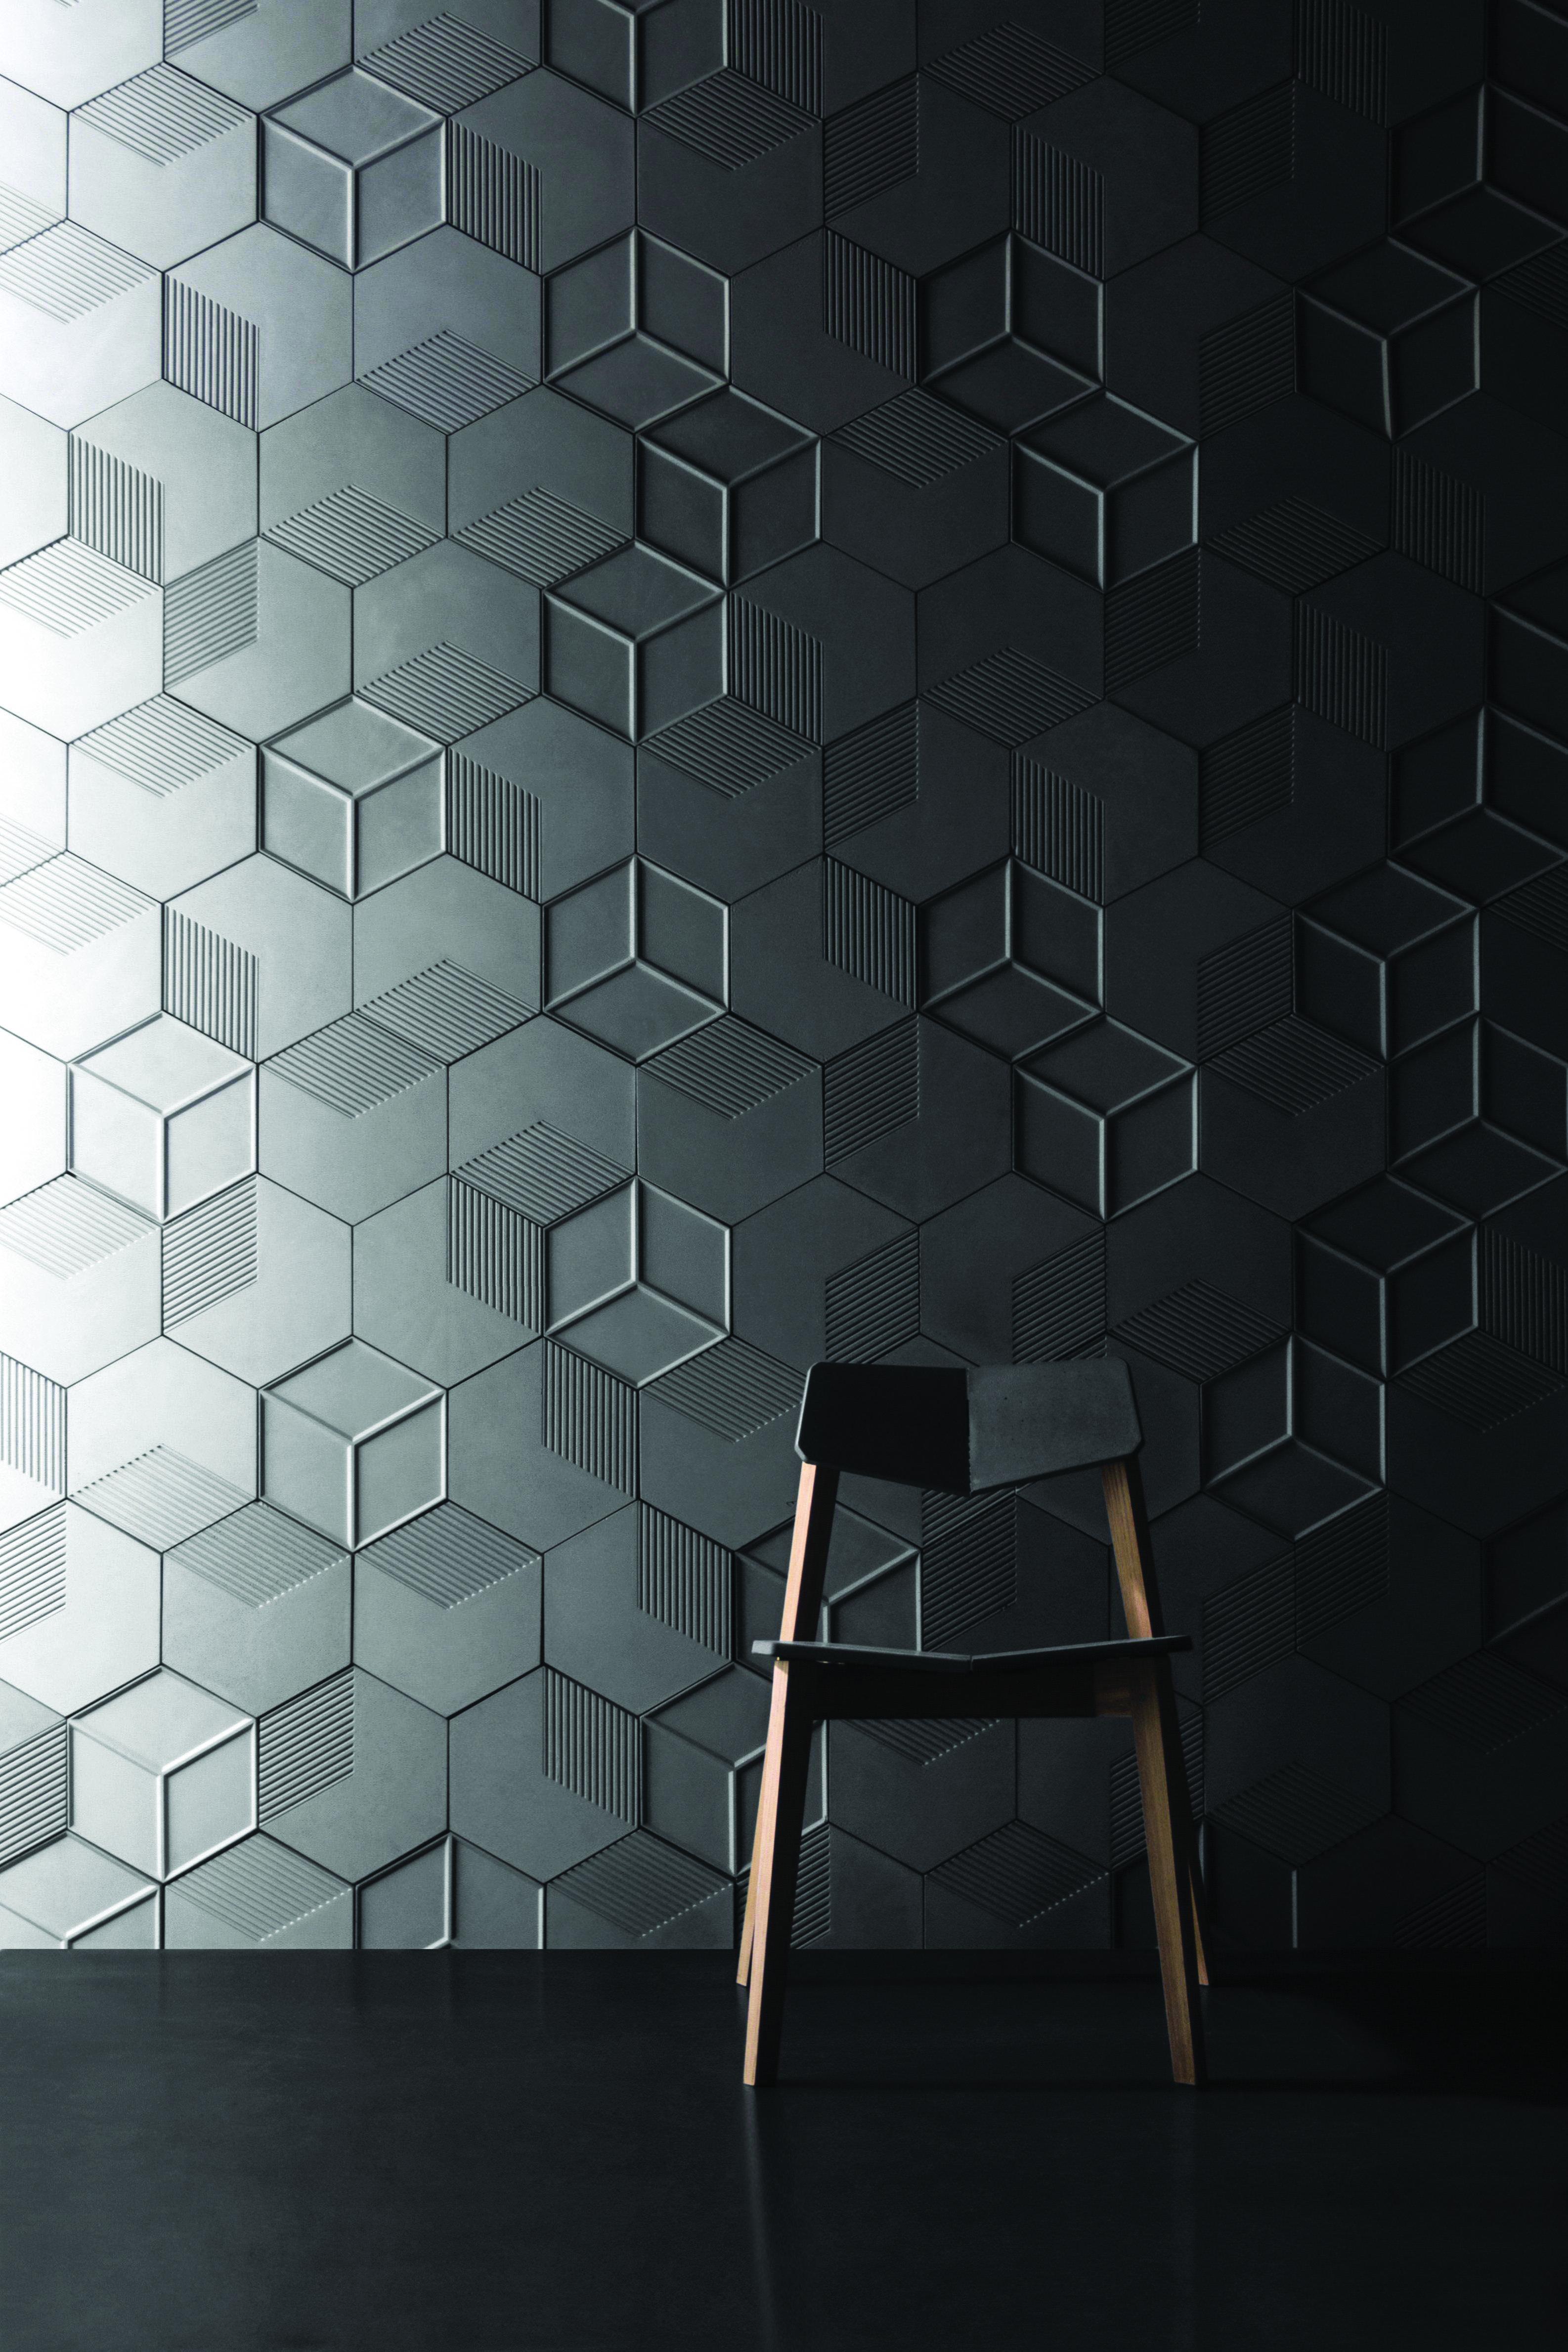 Restroom Ceramic Tile Design Suggestions Homes Tre Decorative Wall Tiles Wall Tiles Design Hexagon Wall Tiles